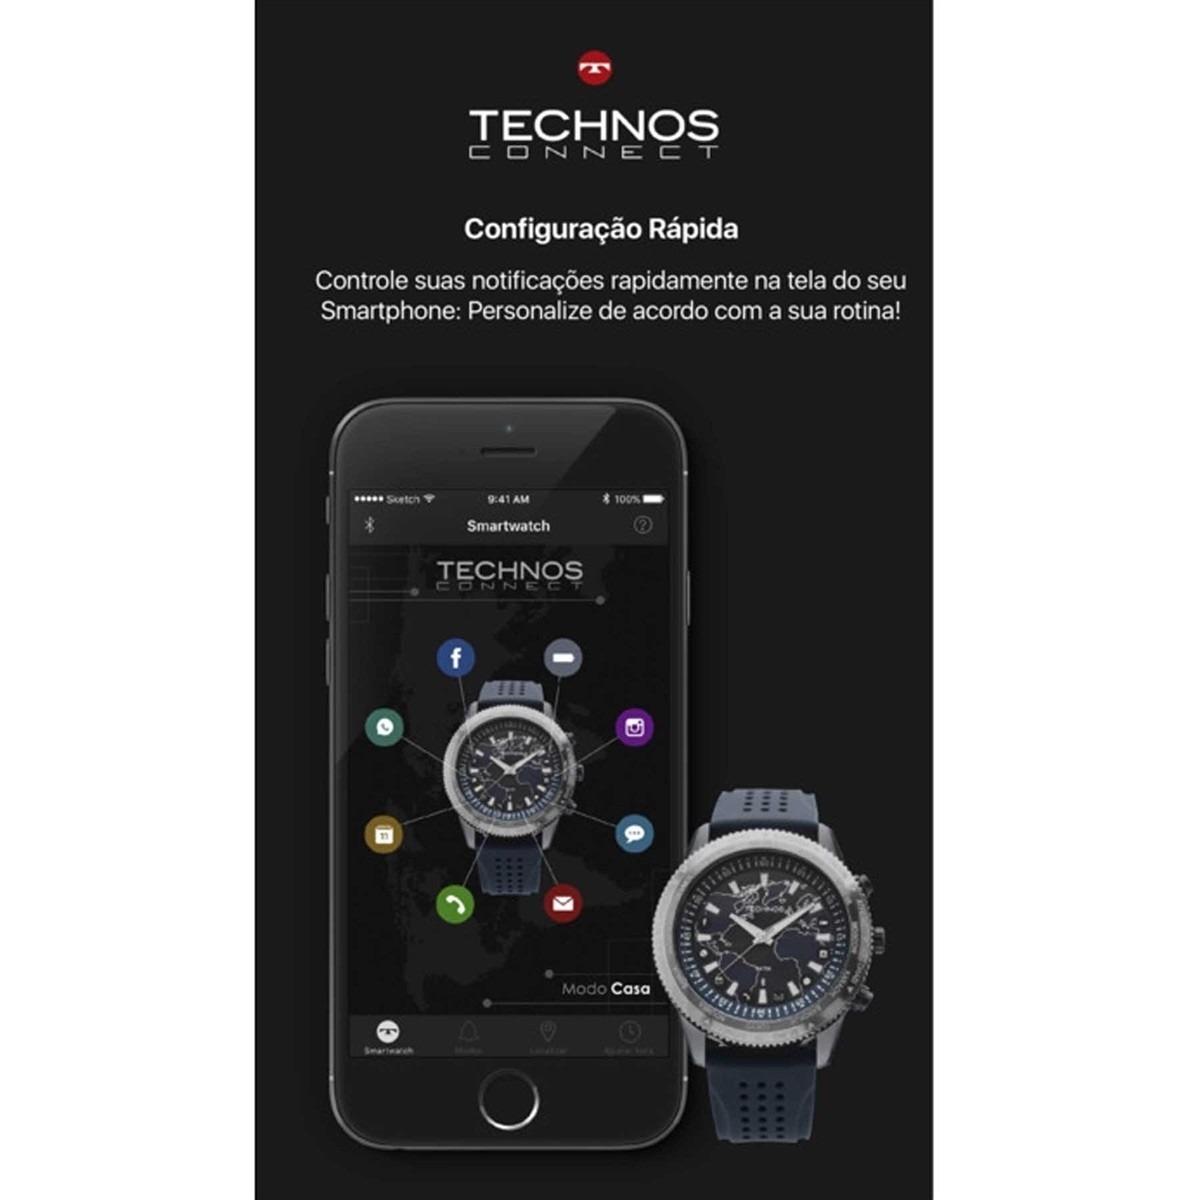 8bd311c8649d2 relógio technos connect 2.0 troca pulseiras - 753ac 4m. Carregando zoom.